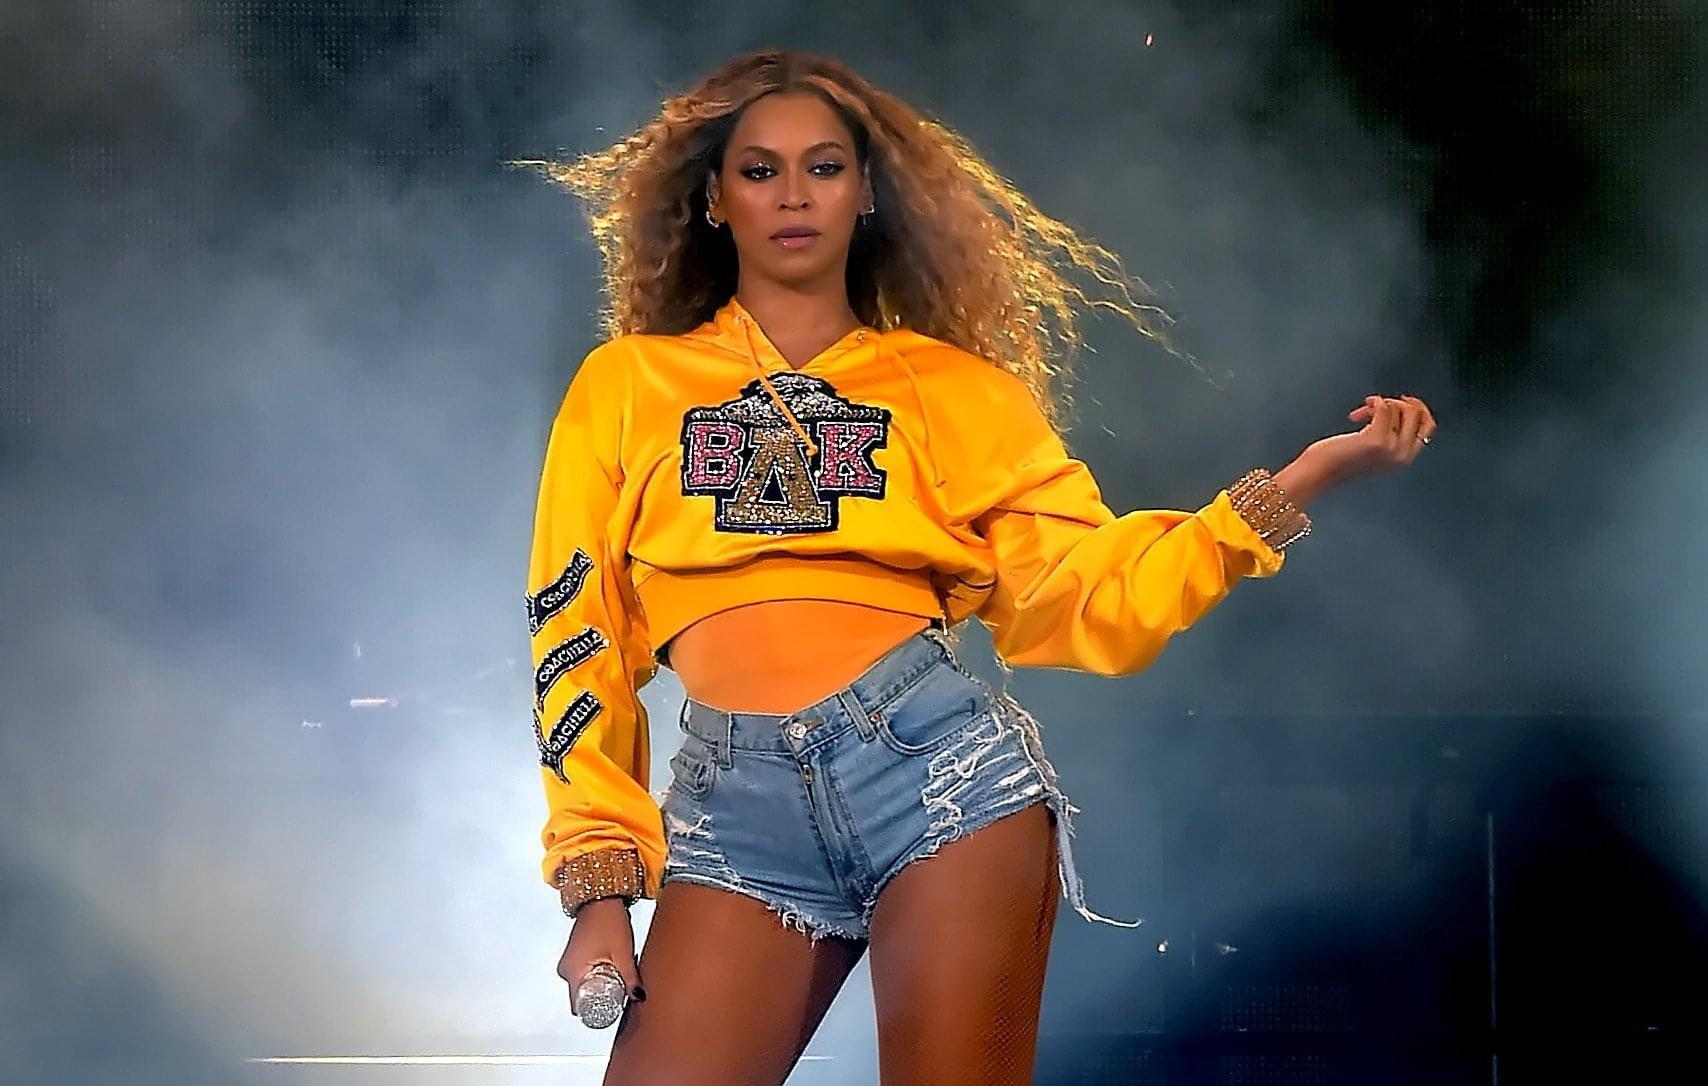 Netflix Is Set To Release Beyonce Documentary On Coachella Performance